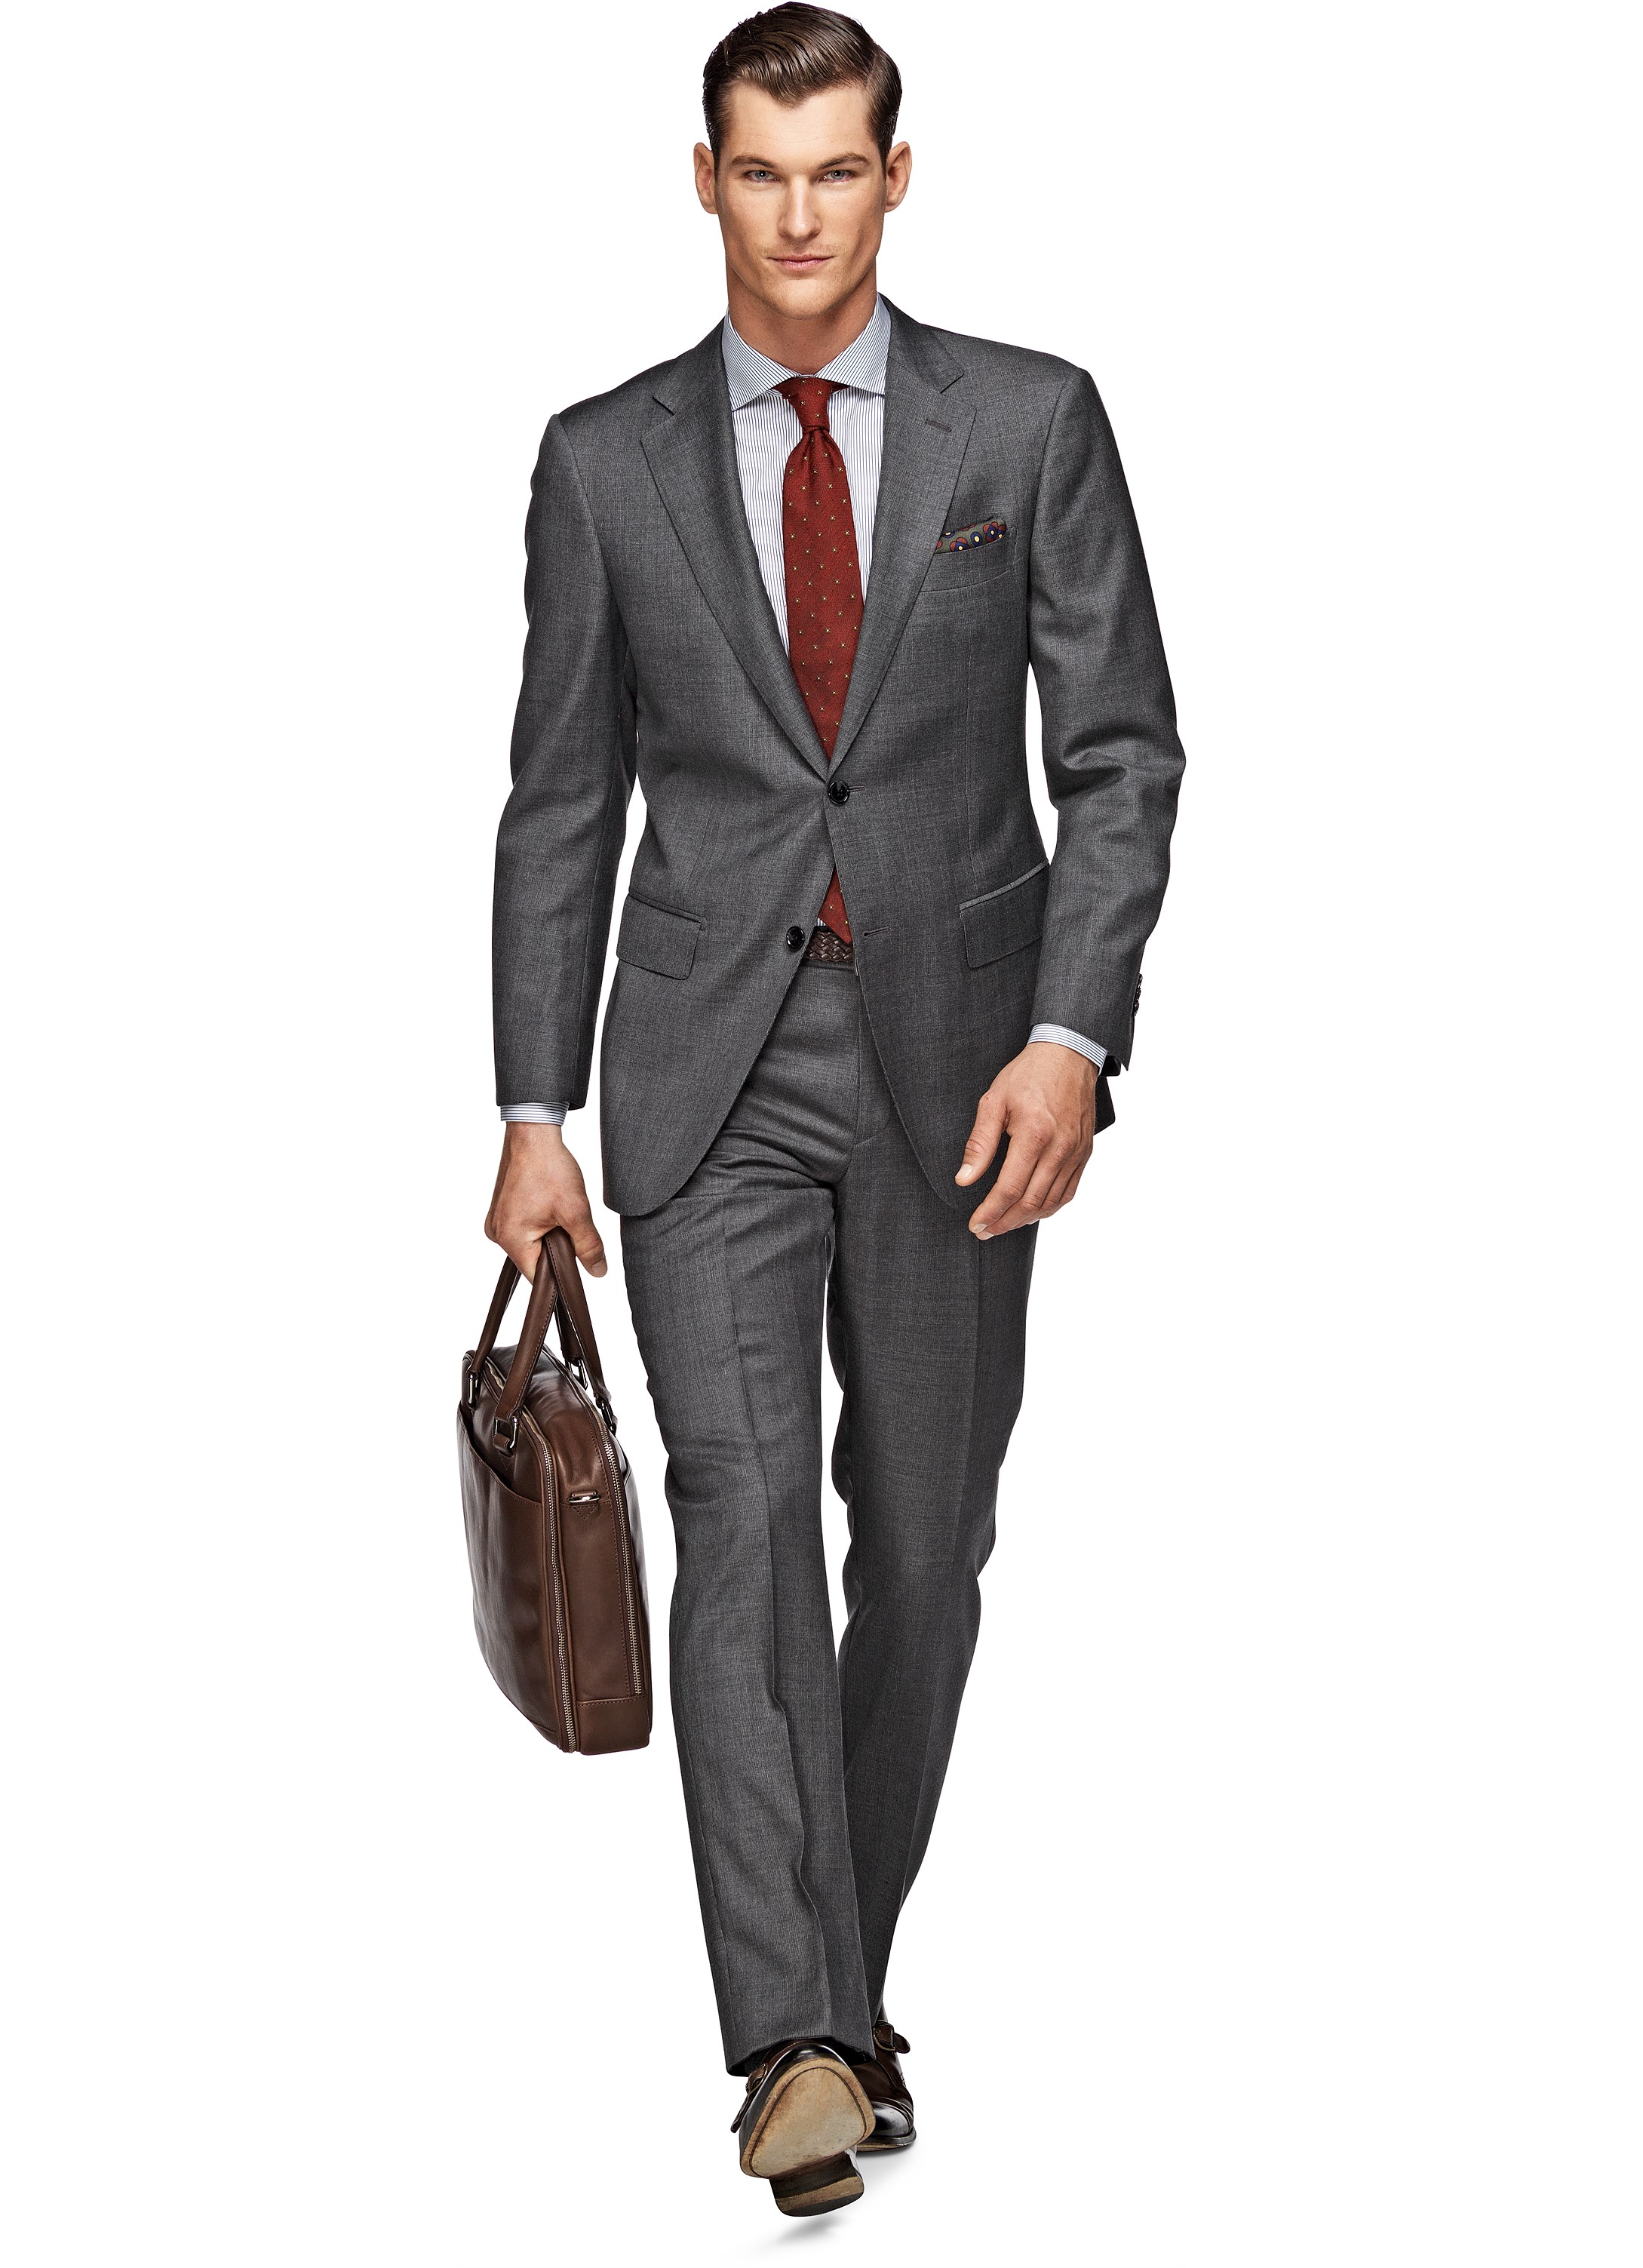 Suit Supply Napoli Staple Gray 38R - $250 OBO